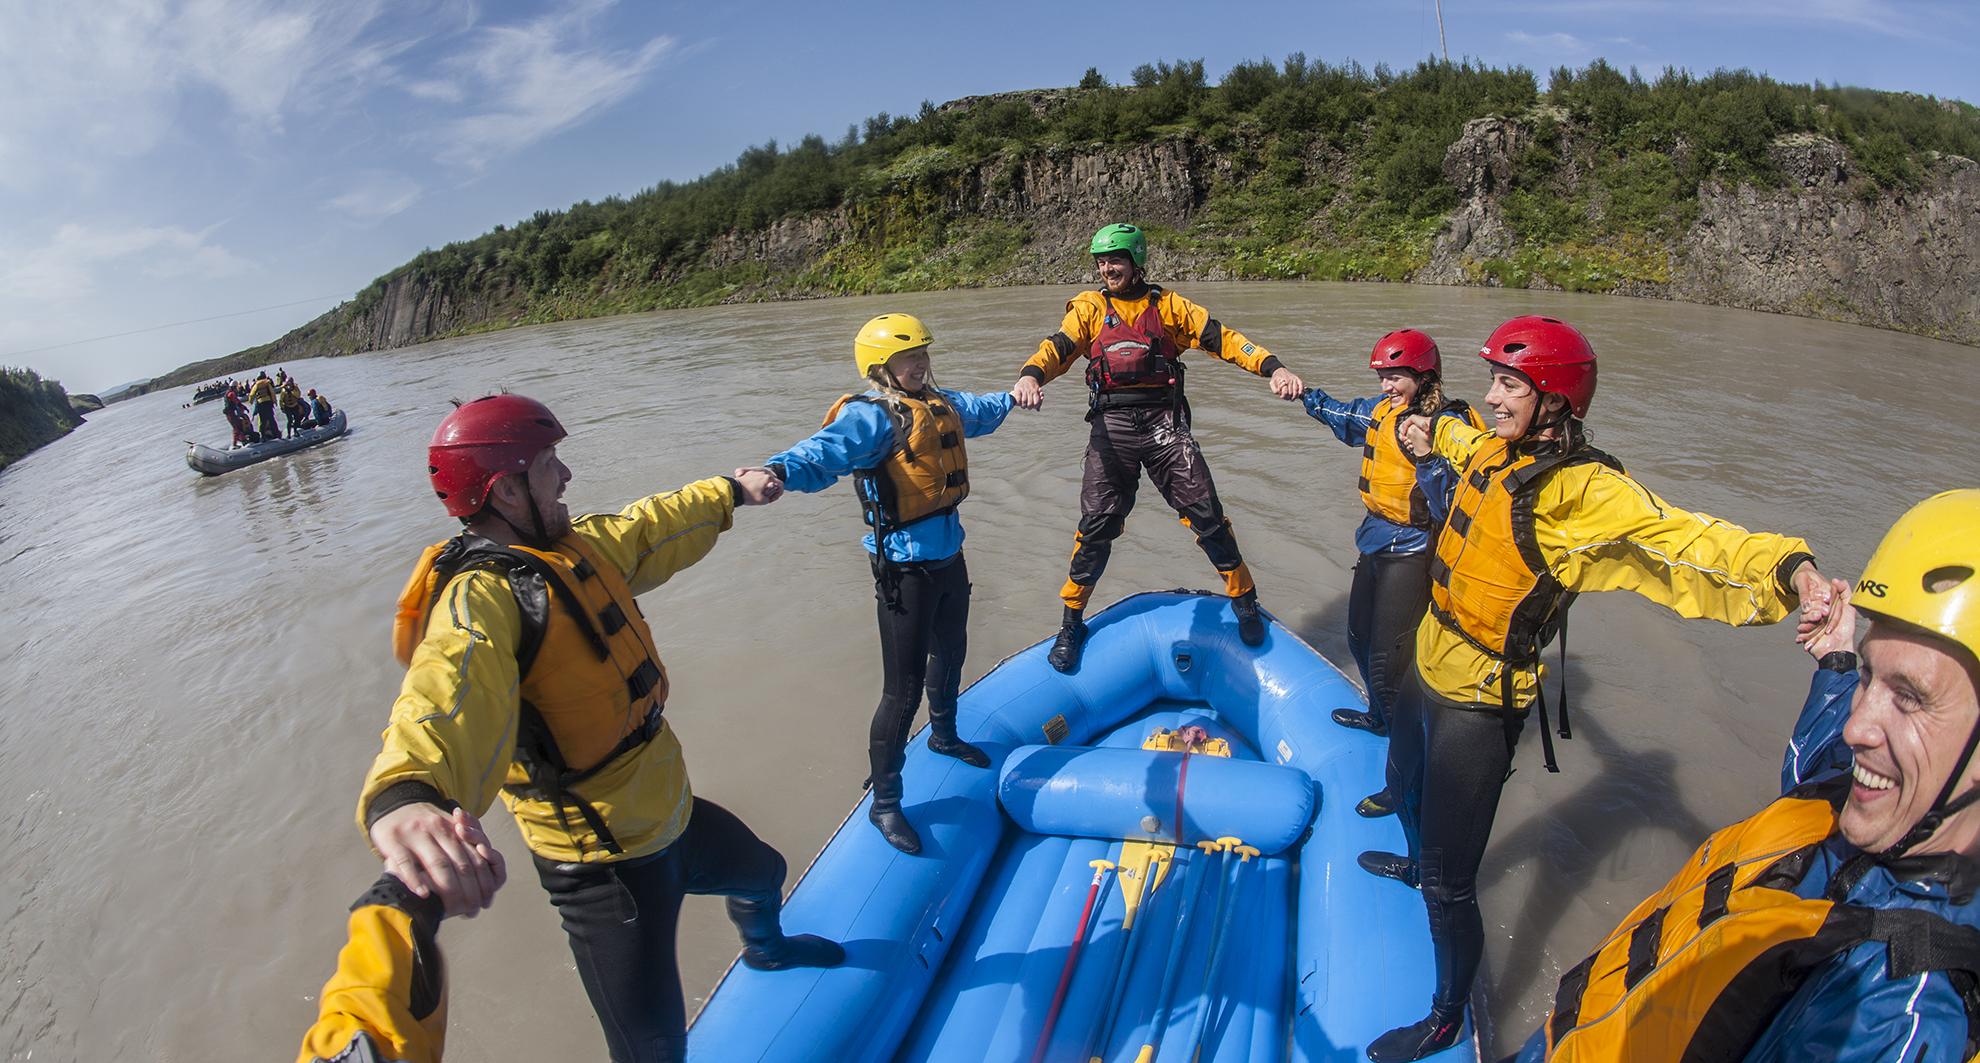 River Rafting Iceland Atlantik Incentive cruise conference DMC PCO.jpg